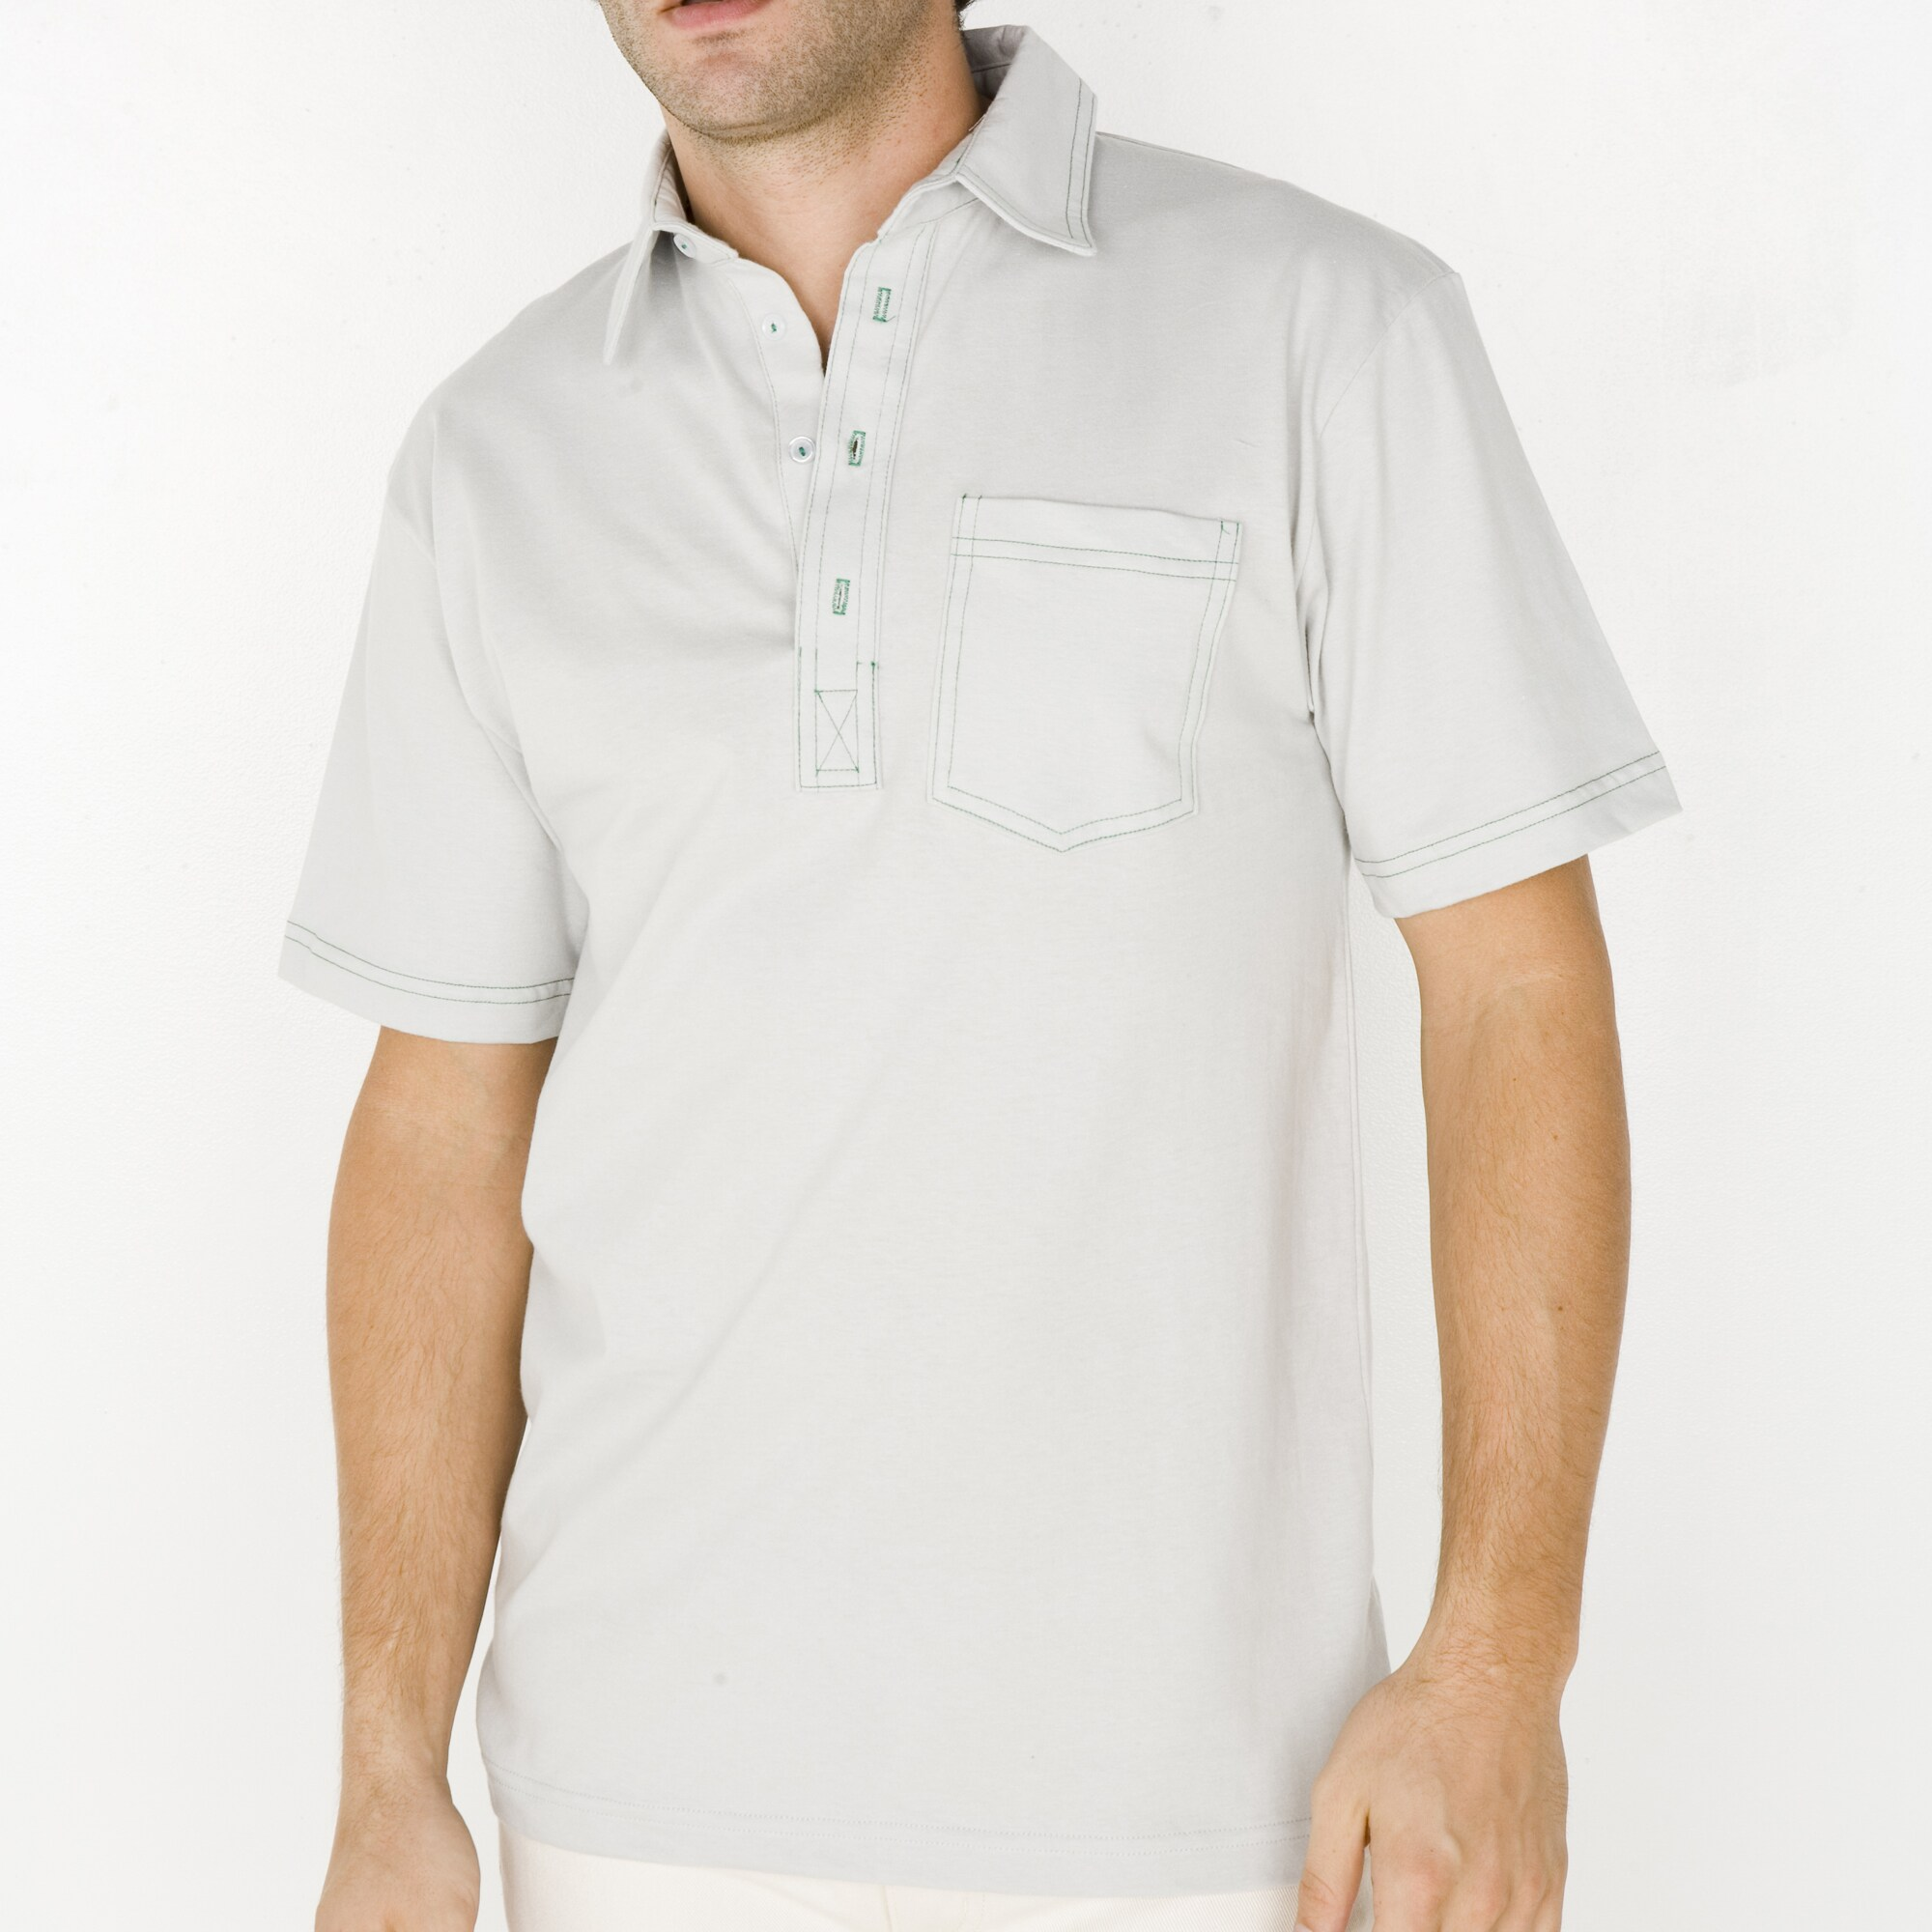 American Apparel Men's Silver/ Kelly Green Fine Jersey Leisure Shirt (2XS)